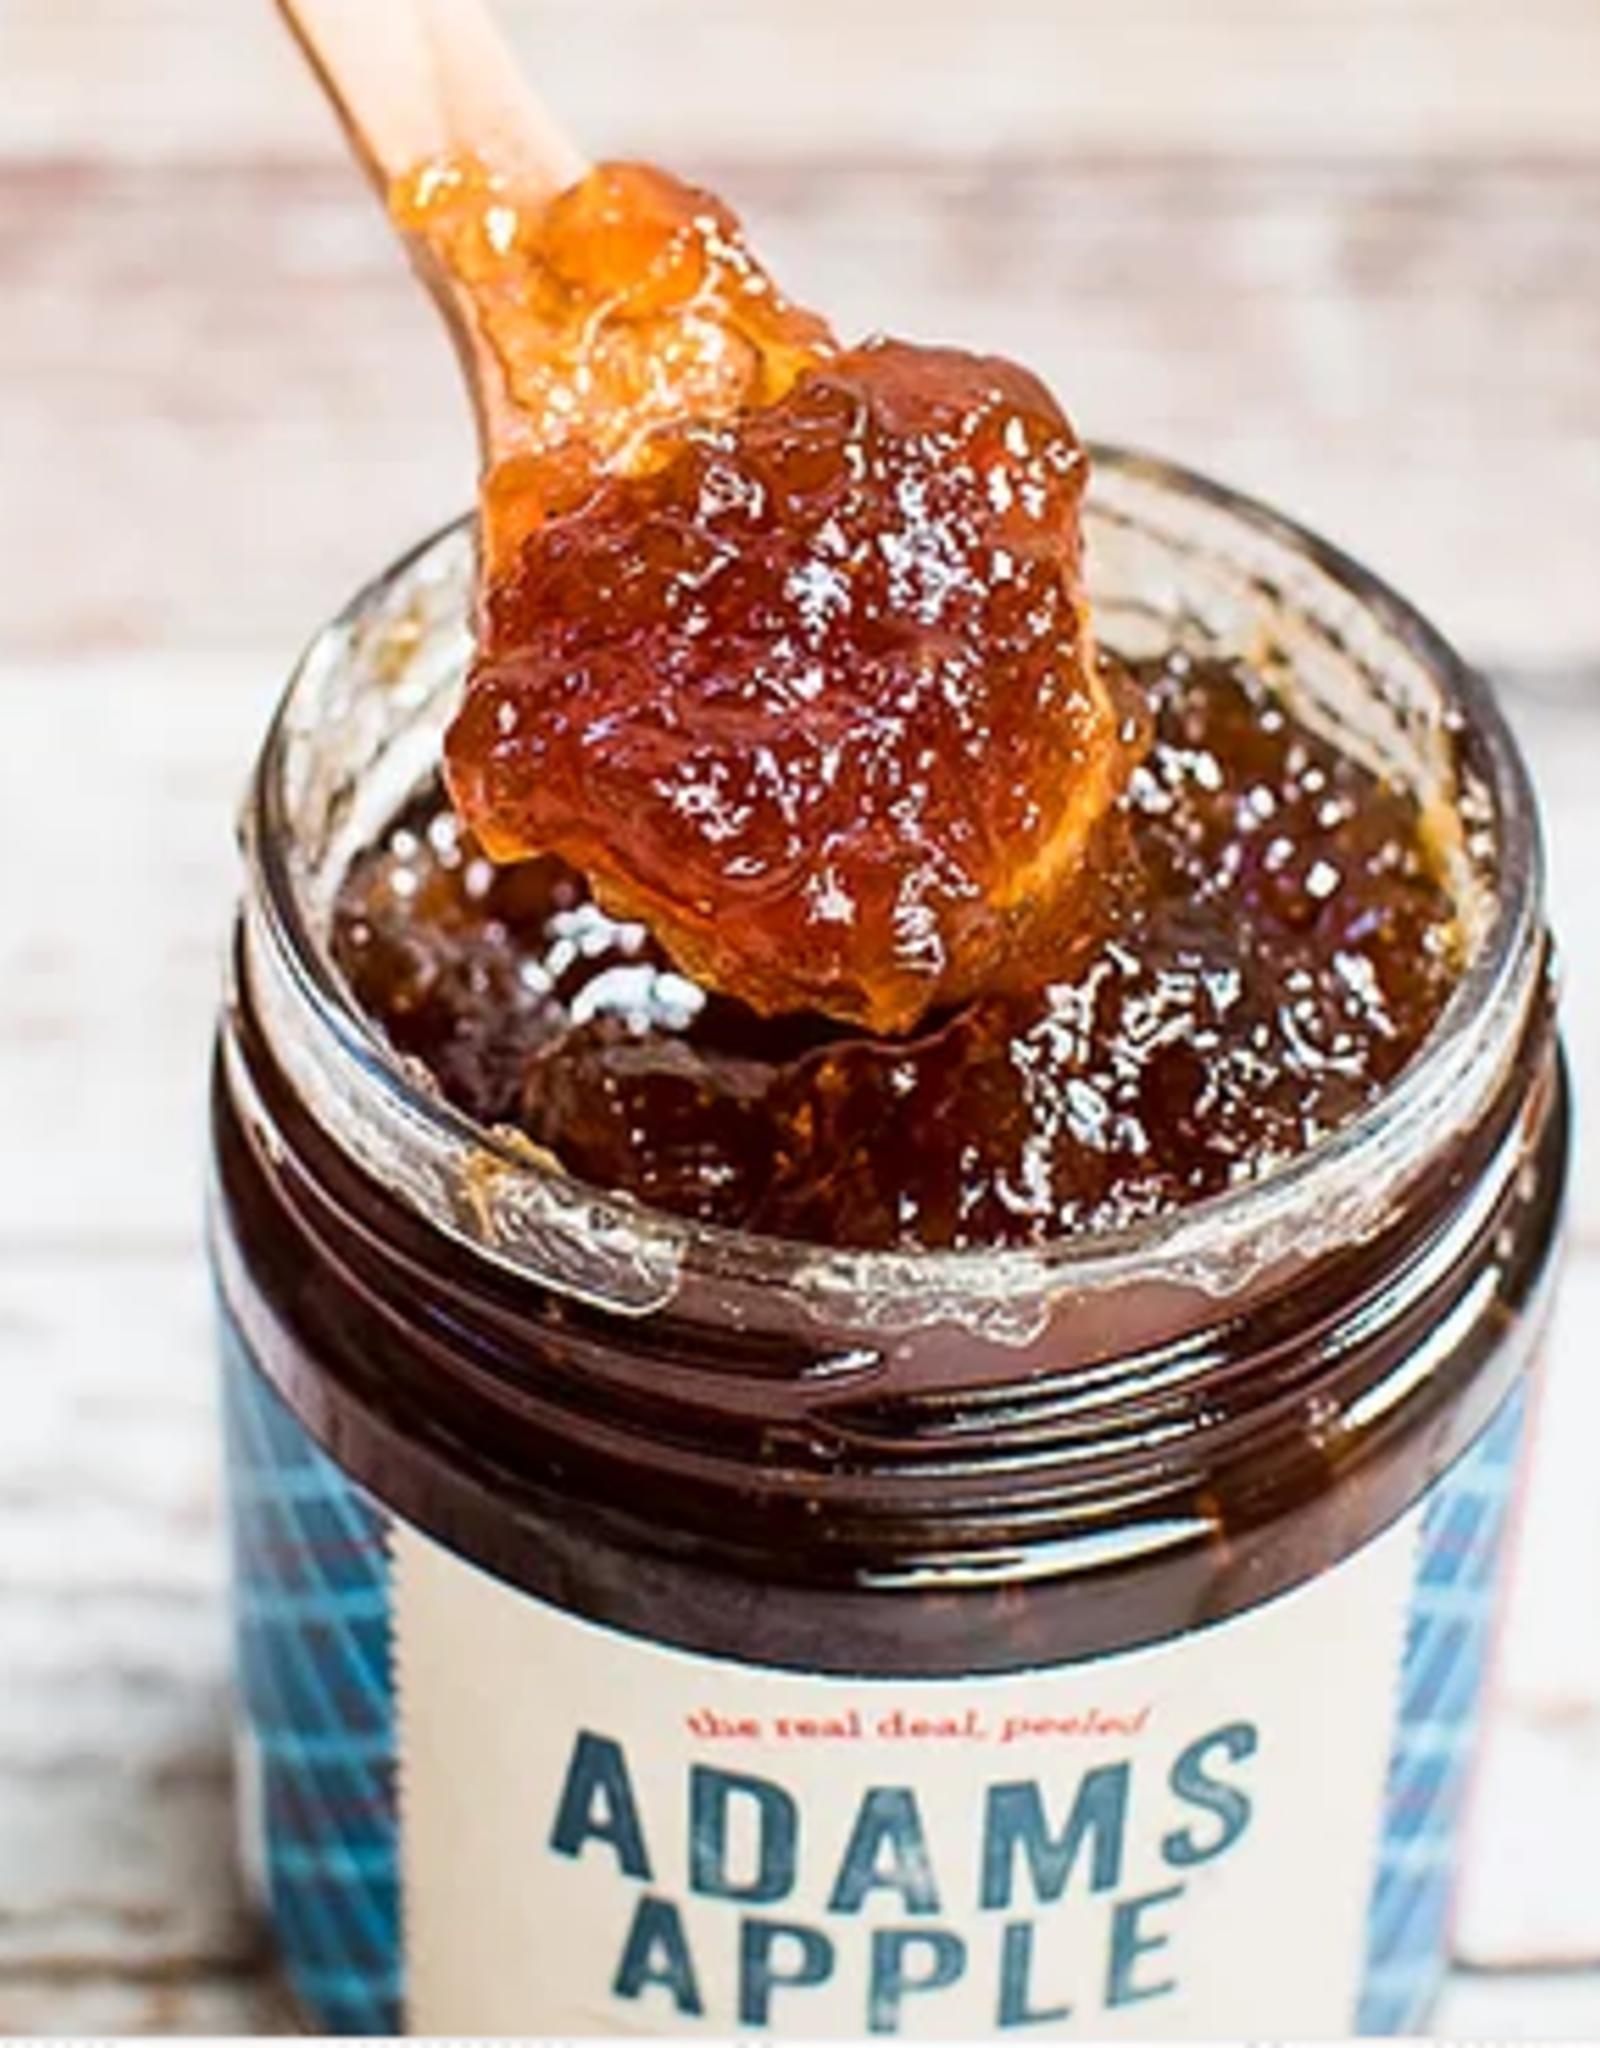 Adams Apple Company Adams Apple Pie Jam 10 oz